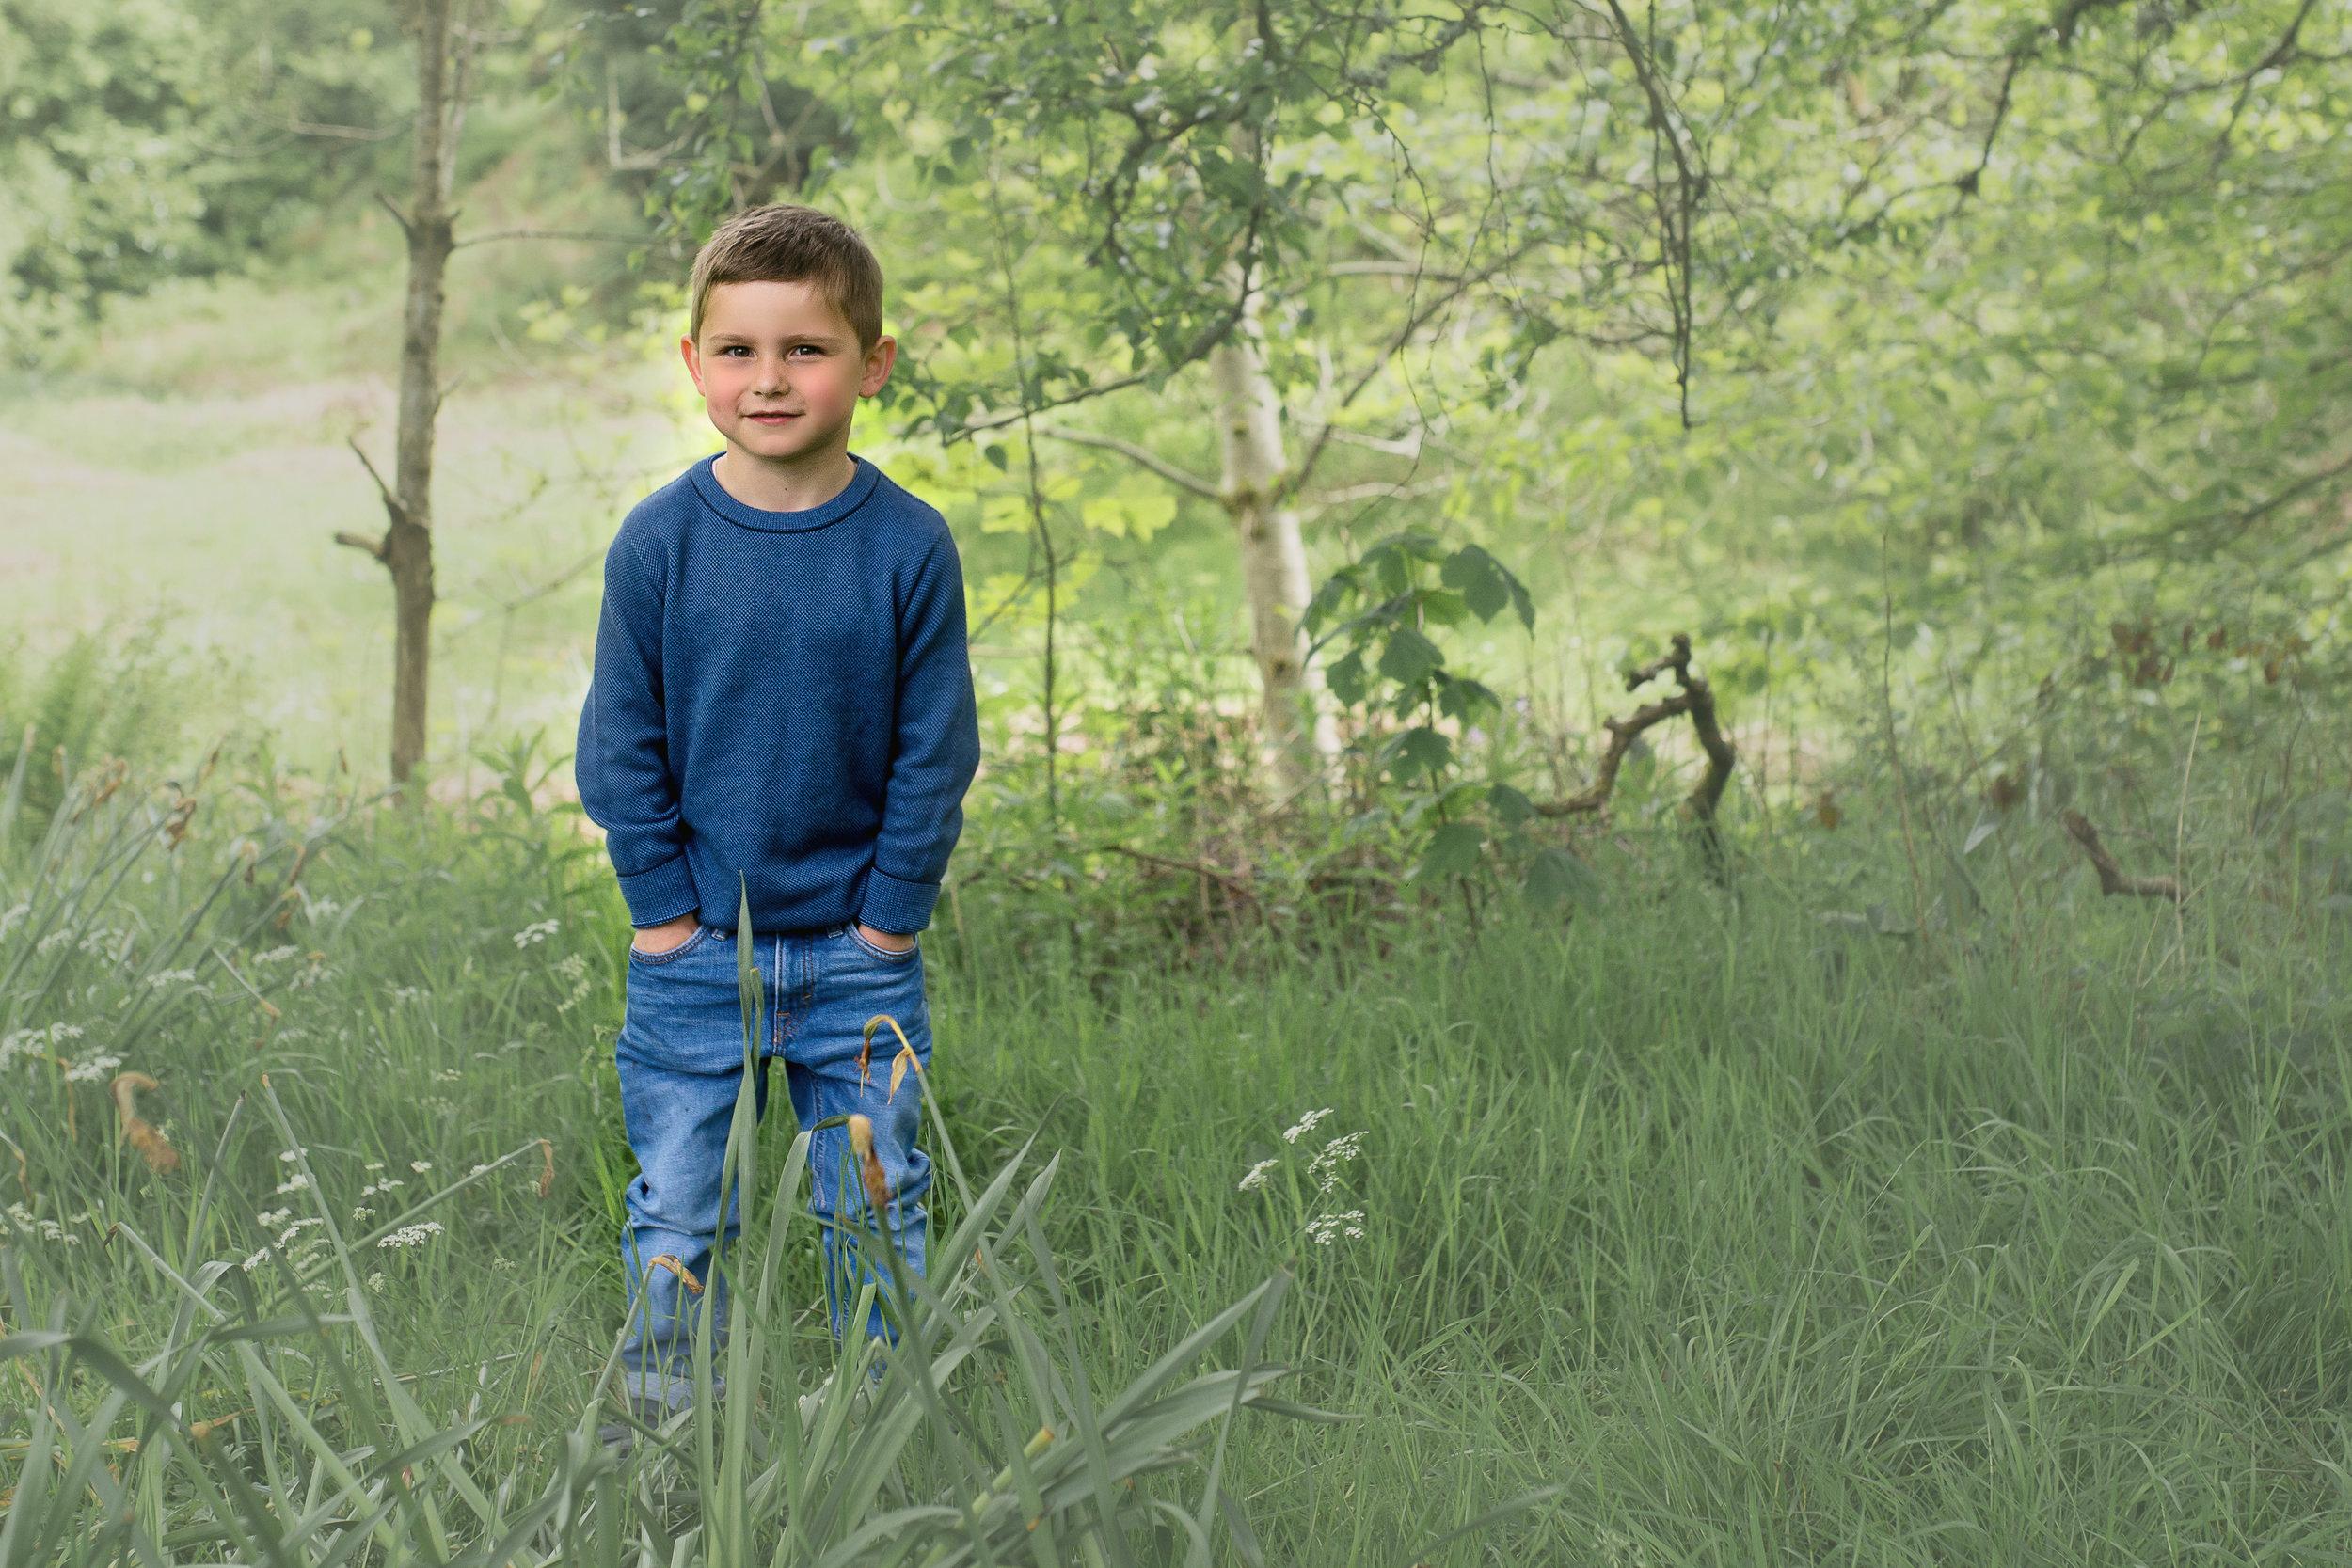 renfrewshire-photographer-boy-hands-in-pockets.jpg